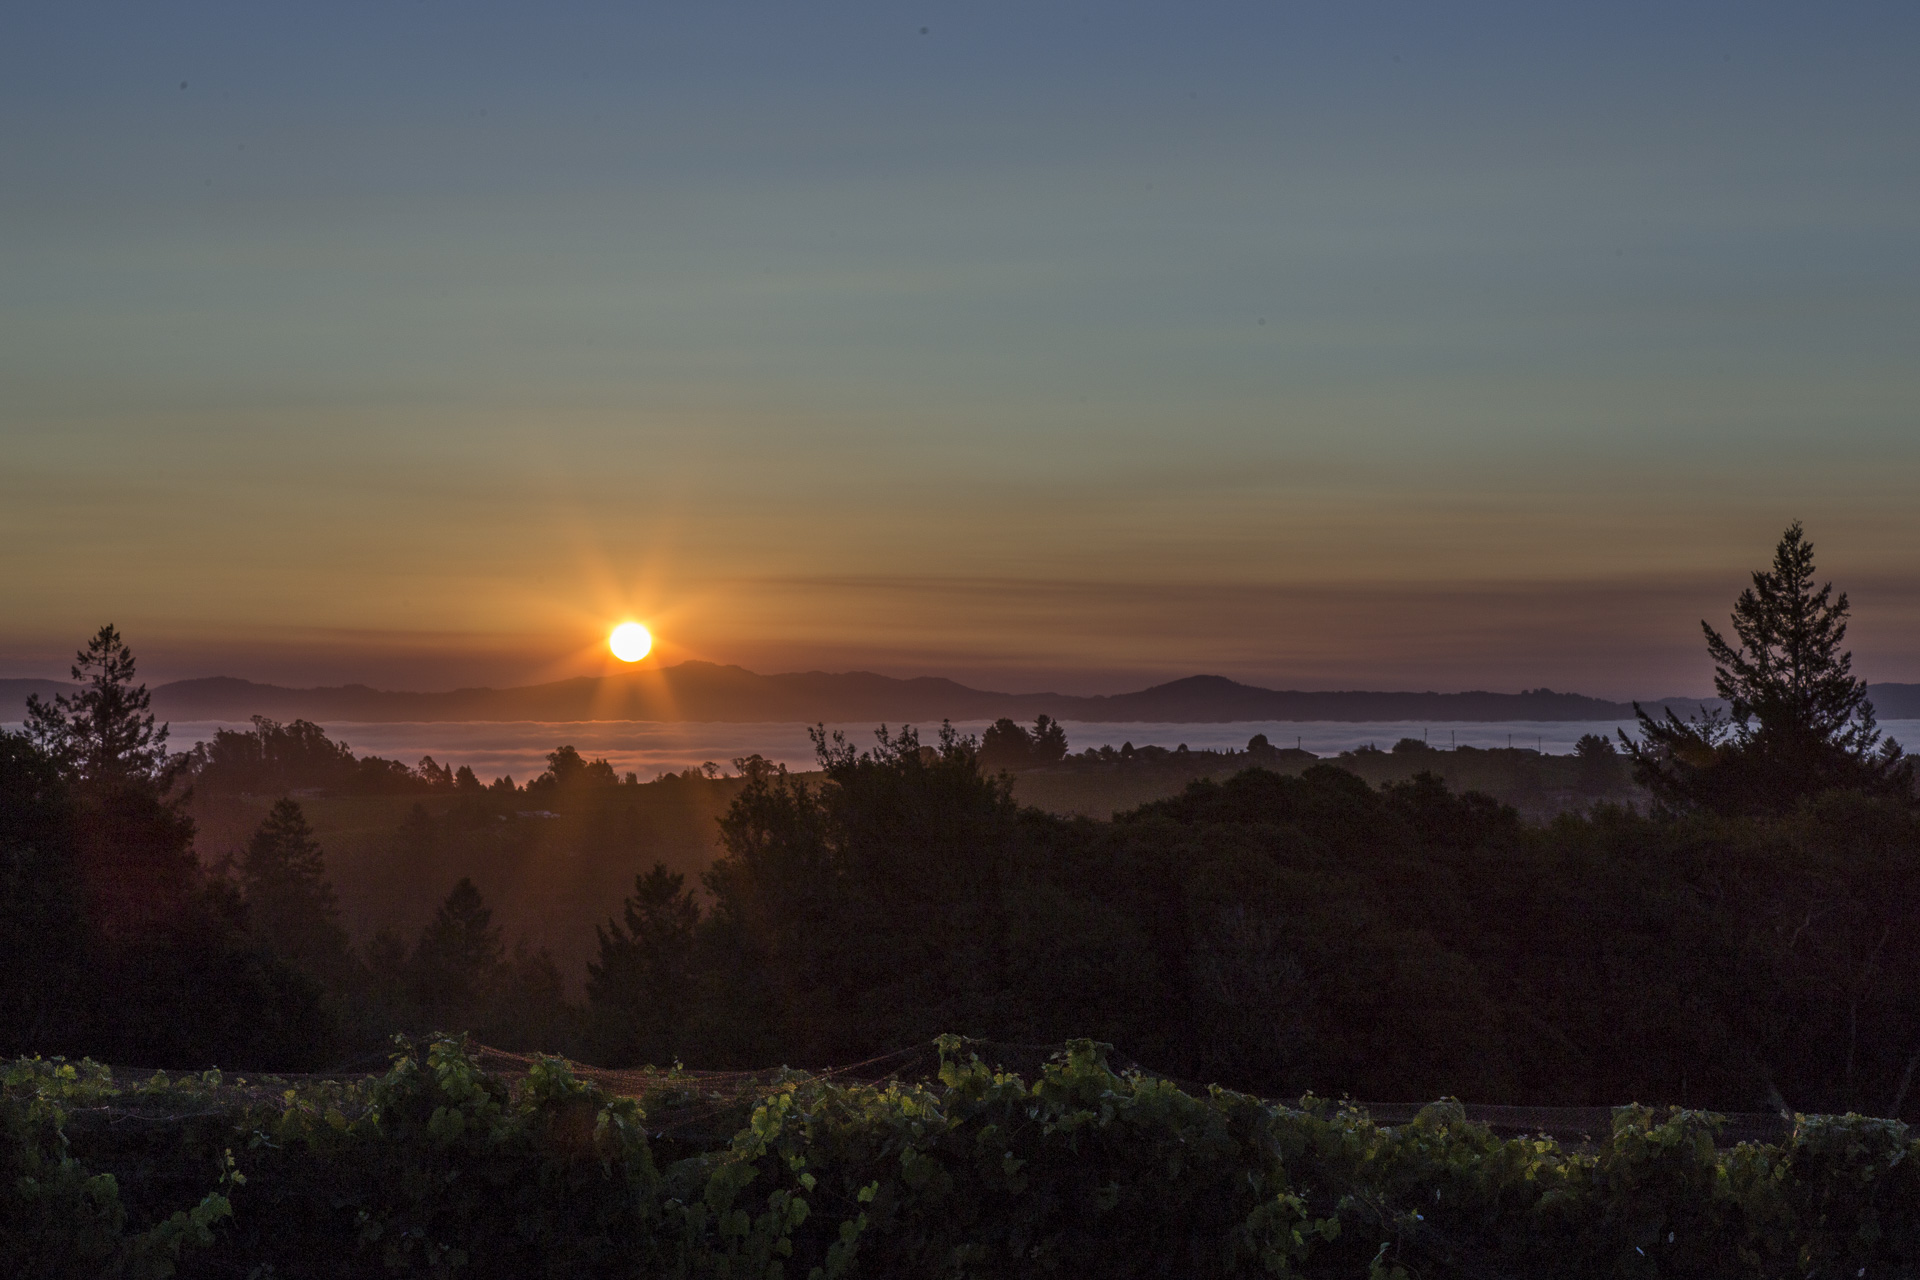 Sunrise on the brink of harvest, Tilton Hill Vineyard, August 2015